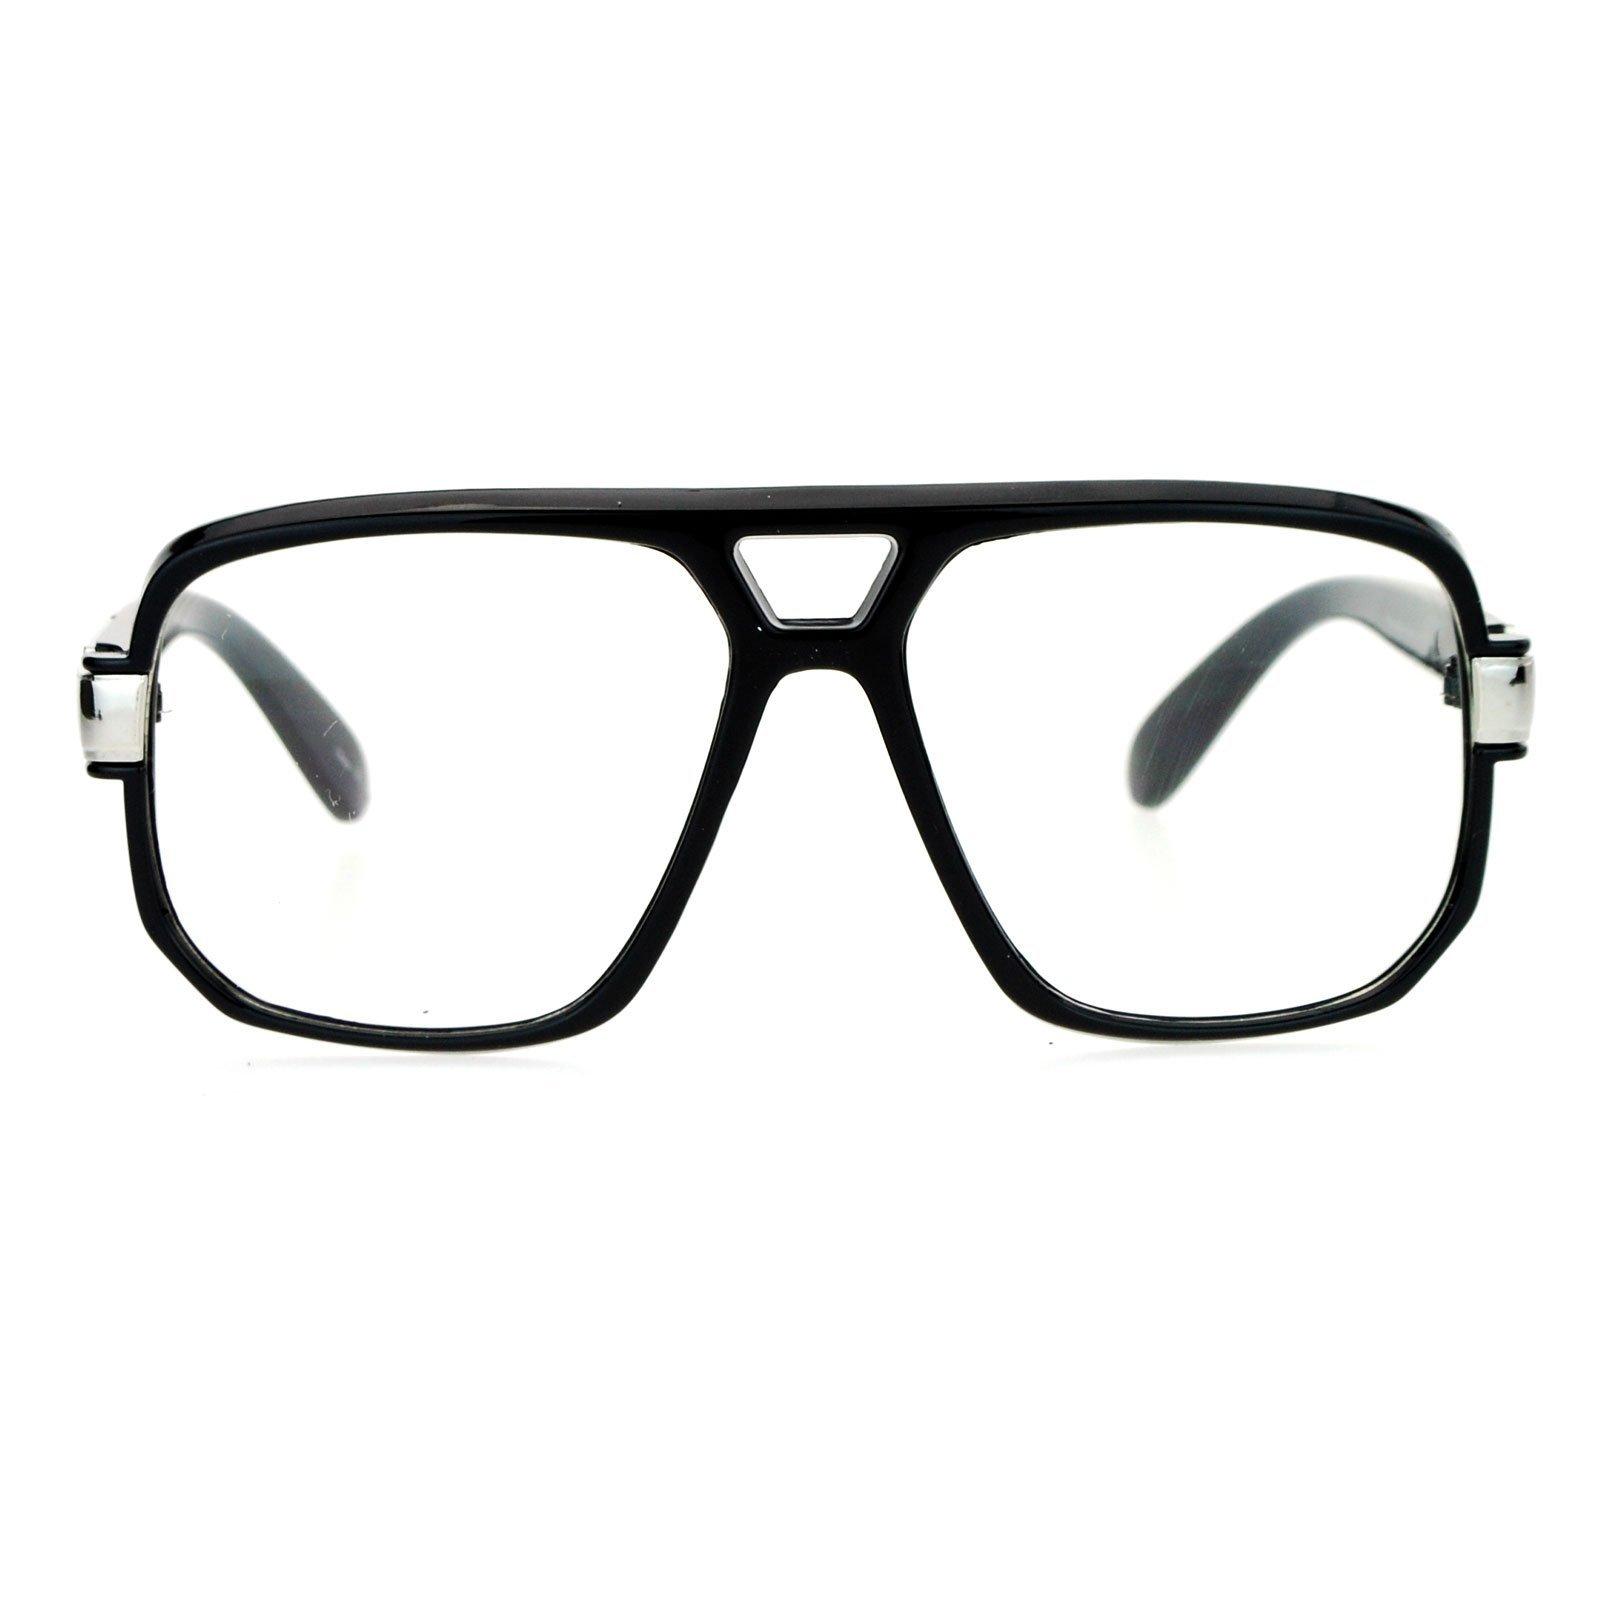 SA106 Retro Hip Hop Rapper Oversize Rectangular Mob Eye Glasses Black